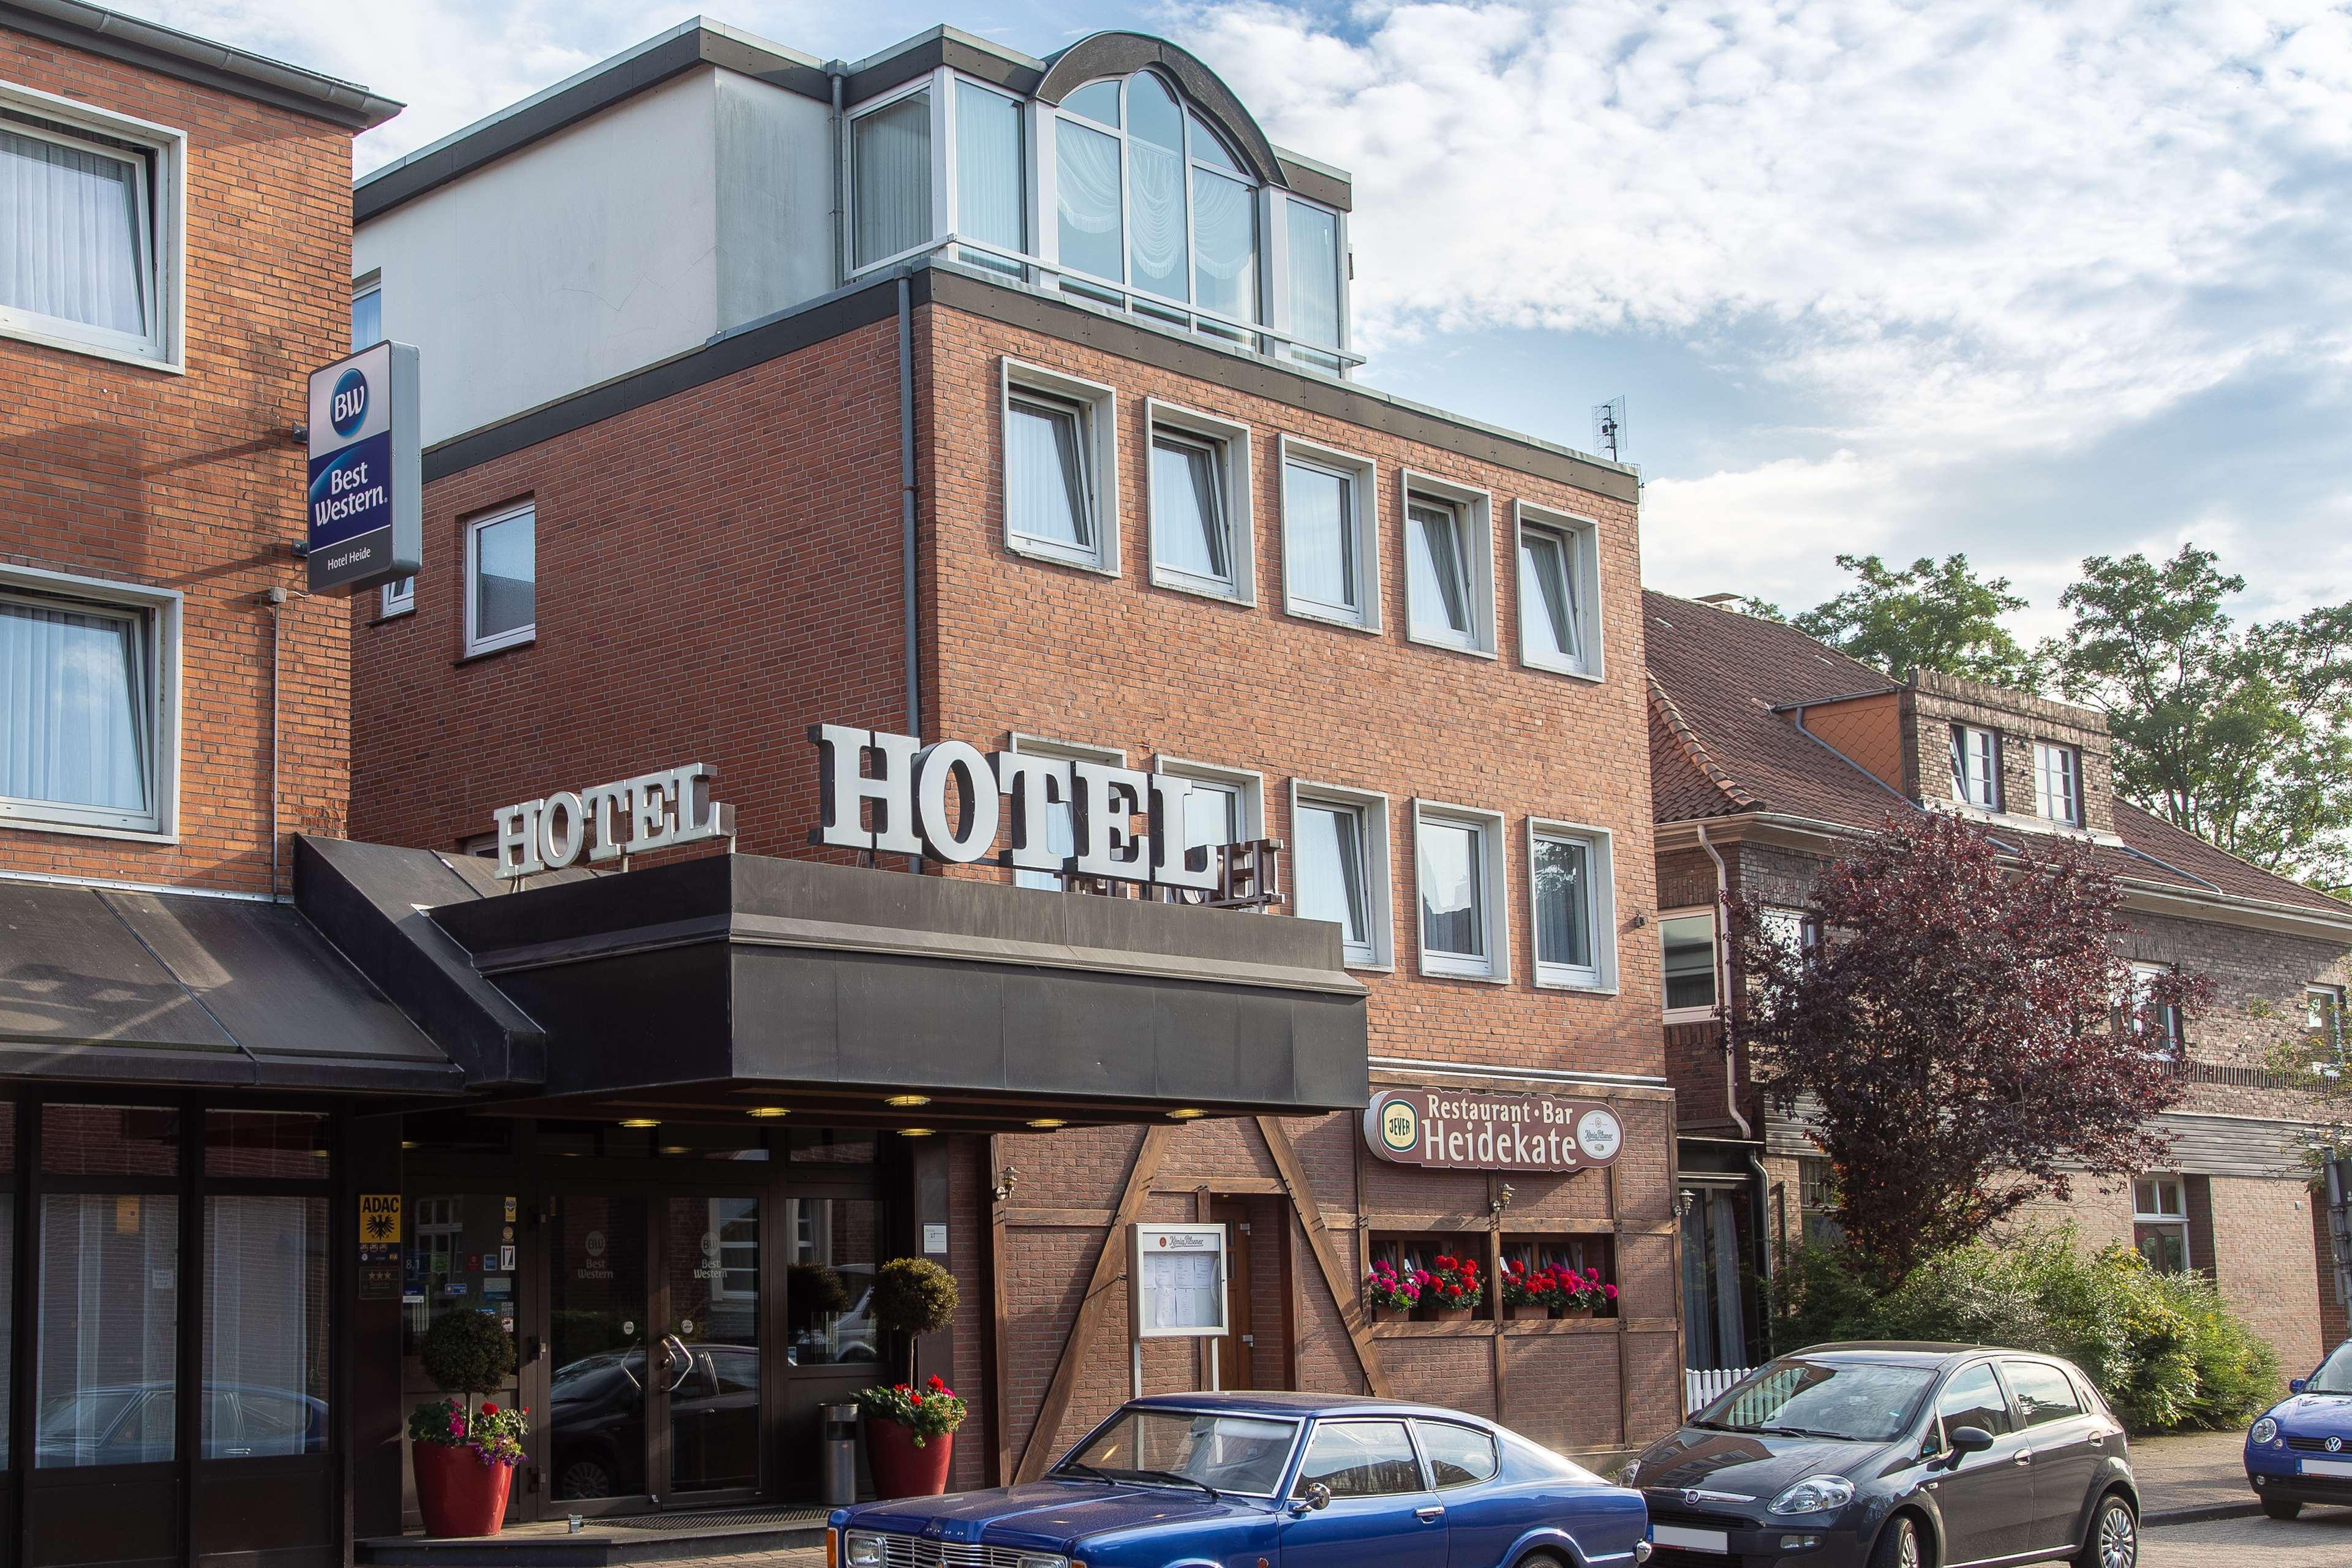 Best Western Hotel Heide - Hotels, Hotels-Restaurants, Oldenburg ...